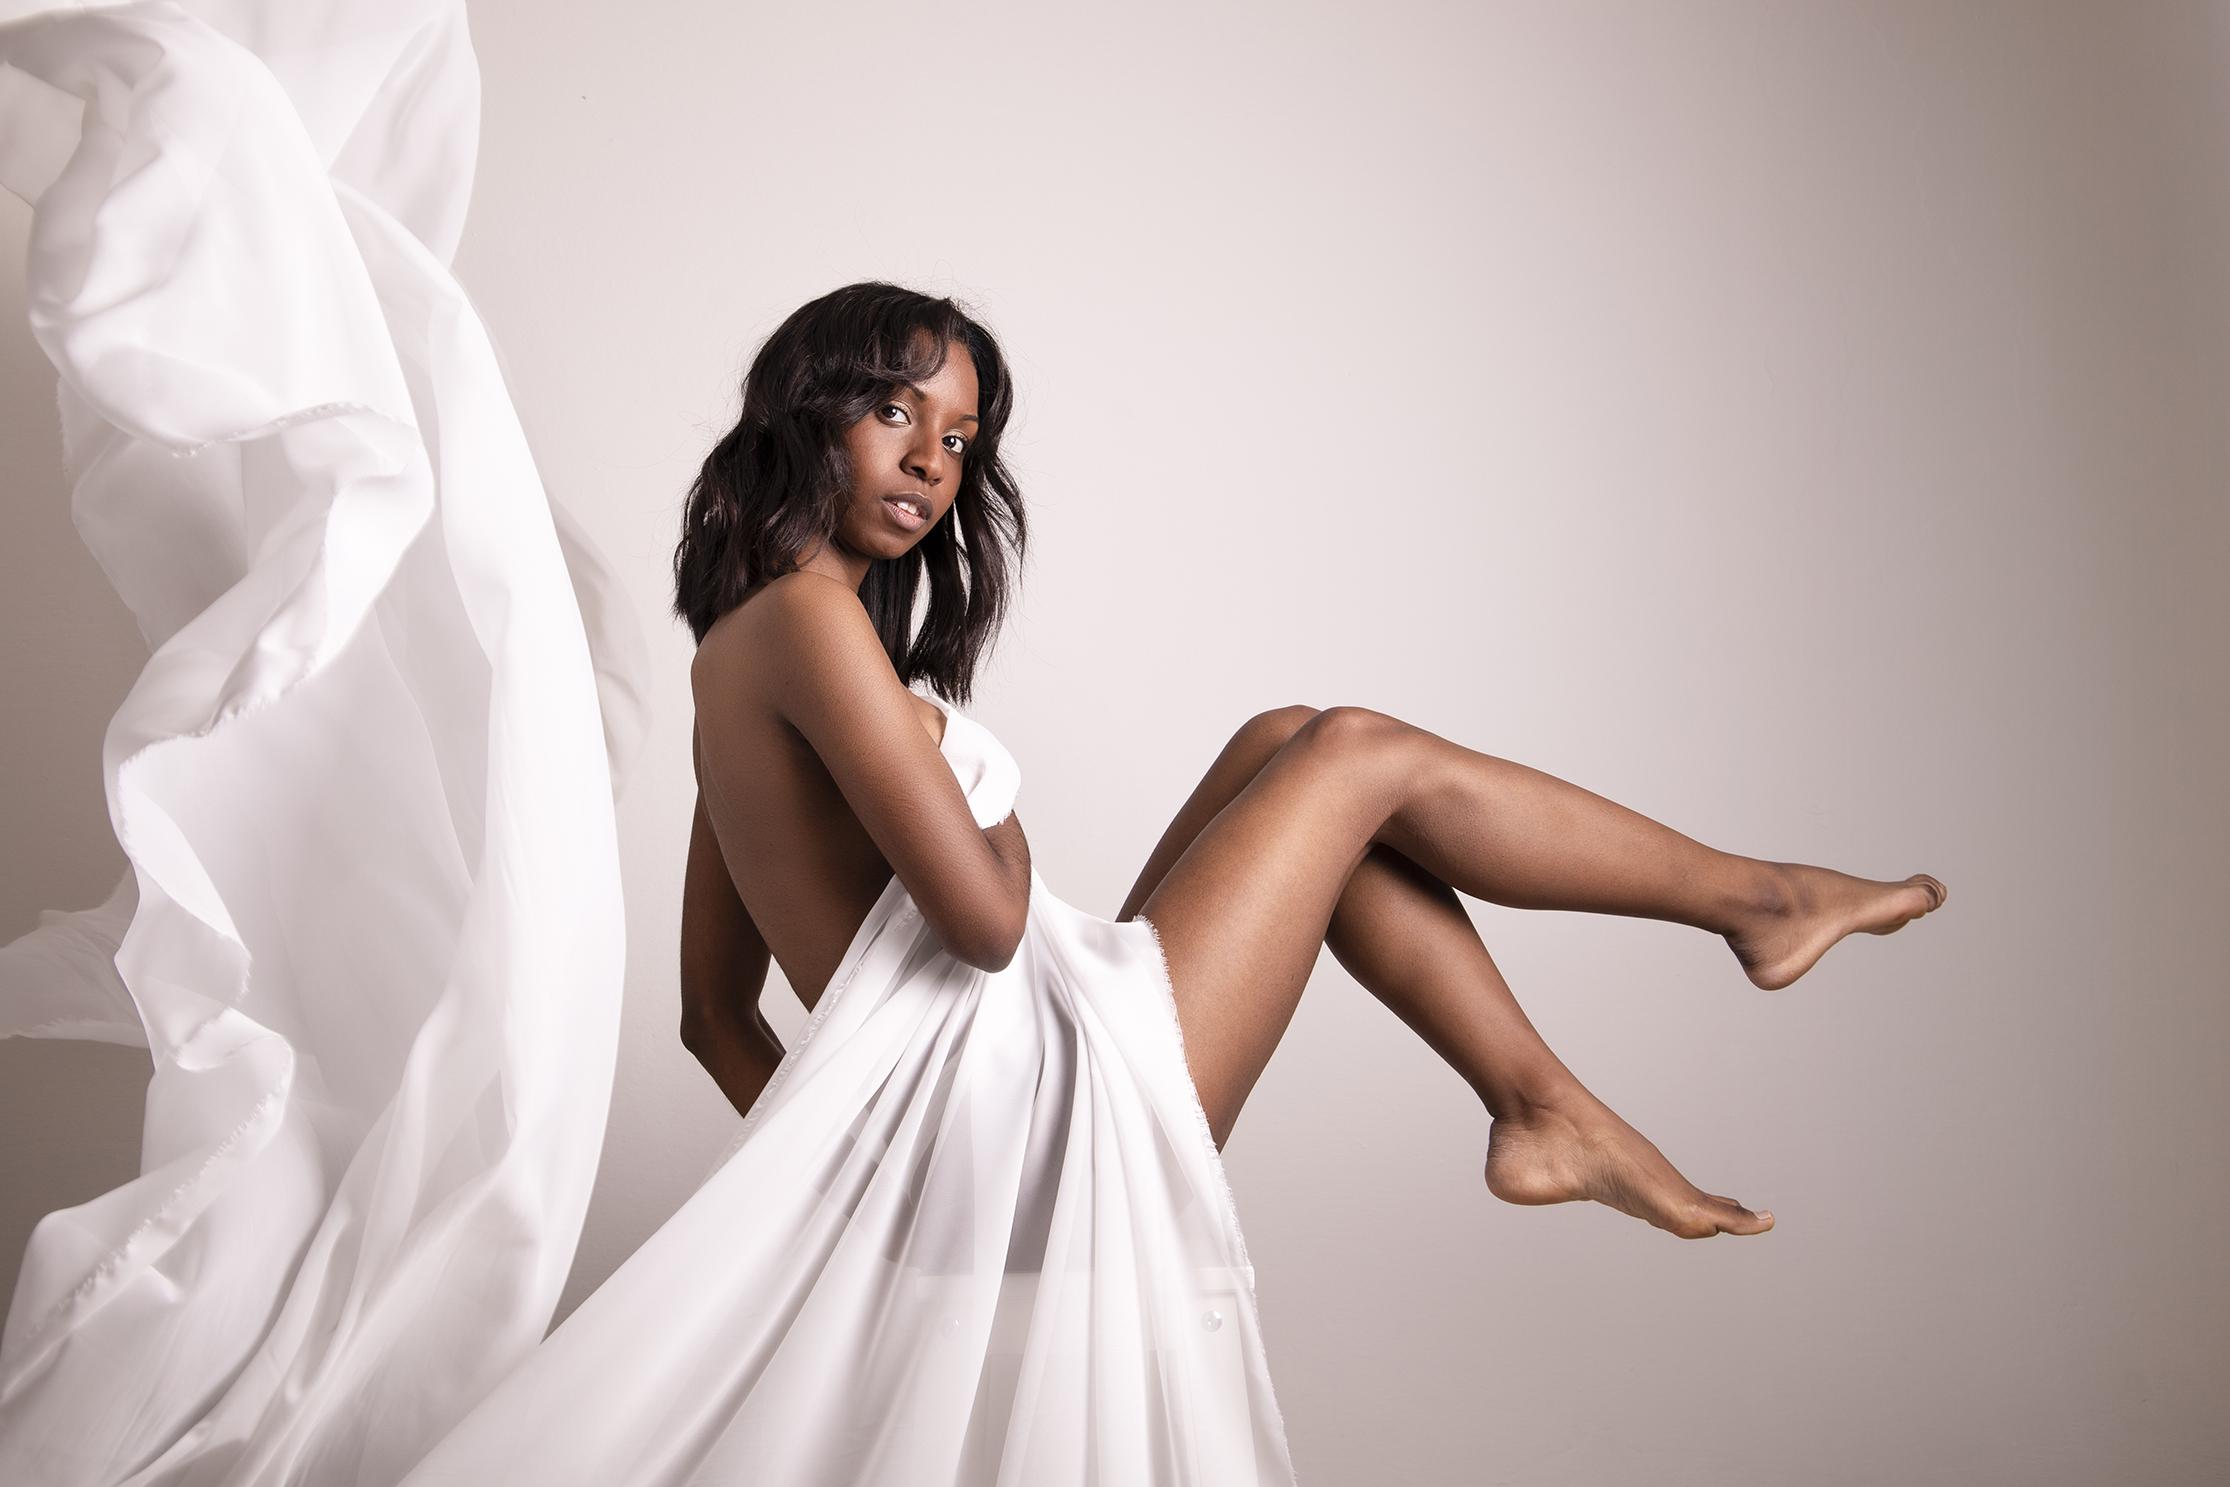 Categorie: Boudoir & Nude, Glamour, Portrait - Photographer: CHIARA LAZZARI - Model: VANESSA FRIZZO - Location: Padova, PD, Italia